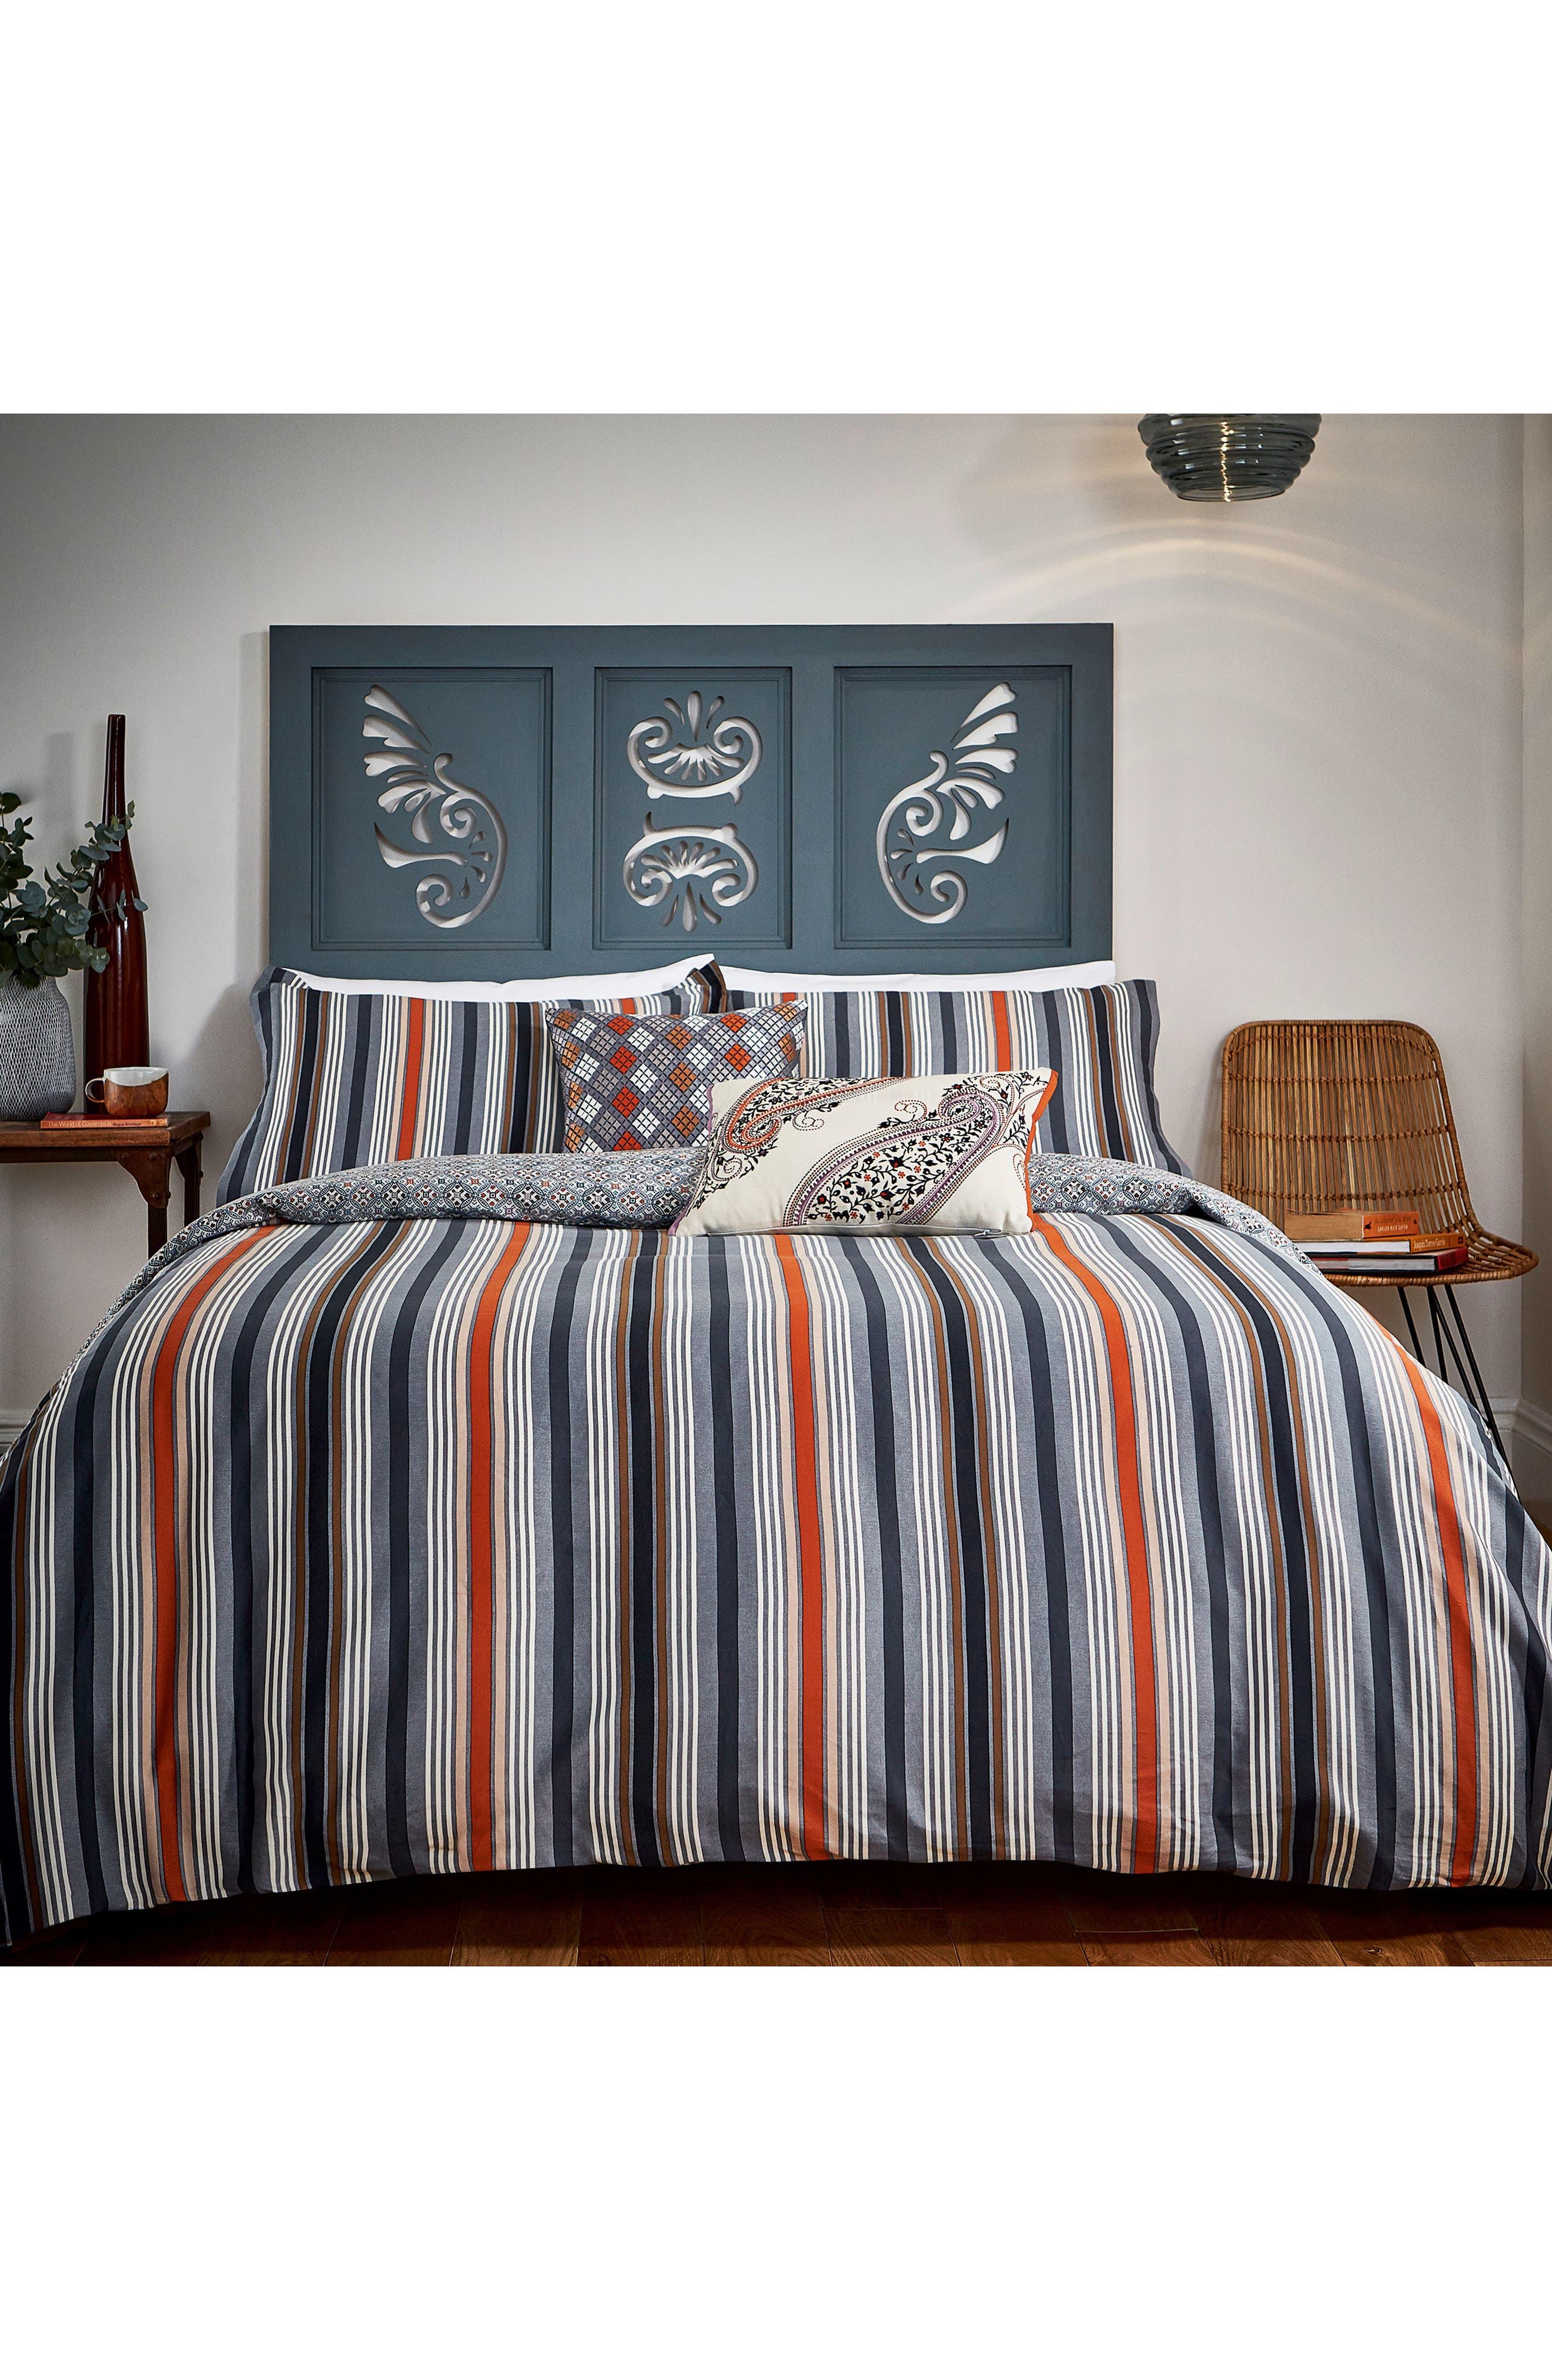 Bedeck Alba Duvet Cover, Sham & Accent Pillow Set